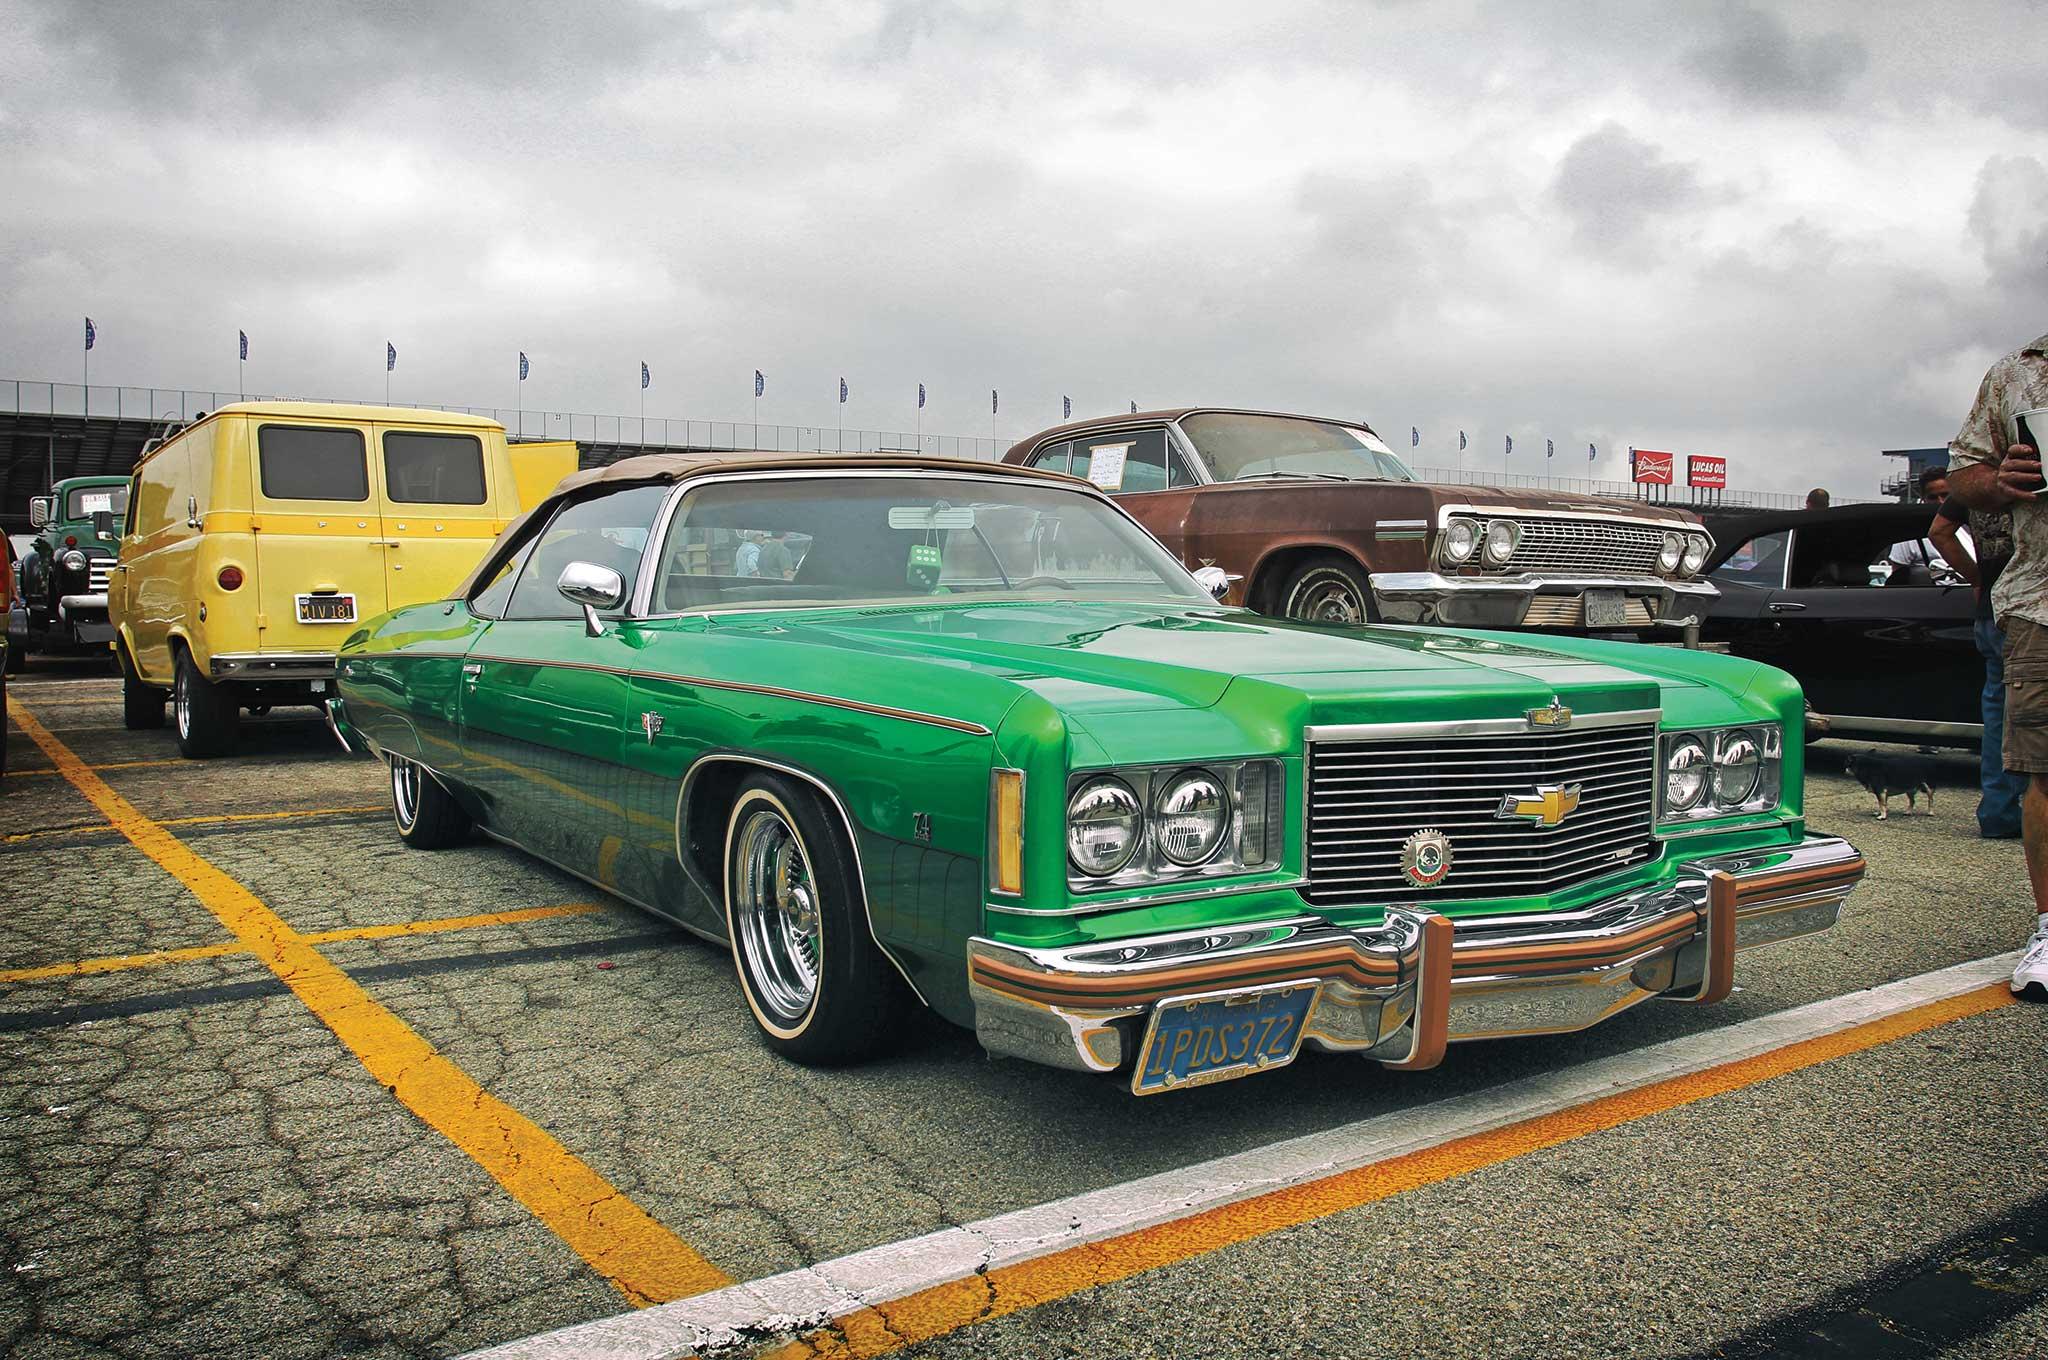 West Coast Corvette >> Pomona Swap Meet & Classic Car Show - Lowrider